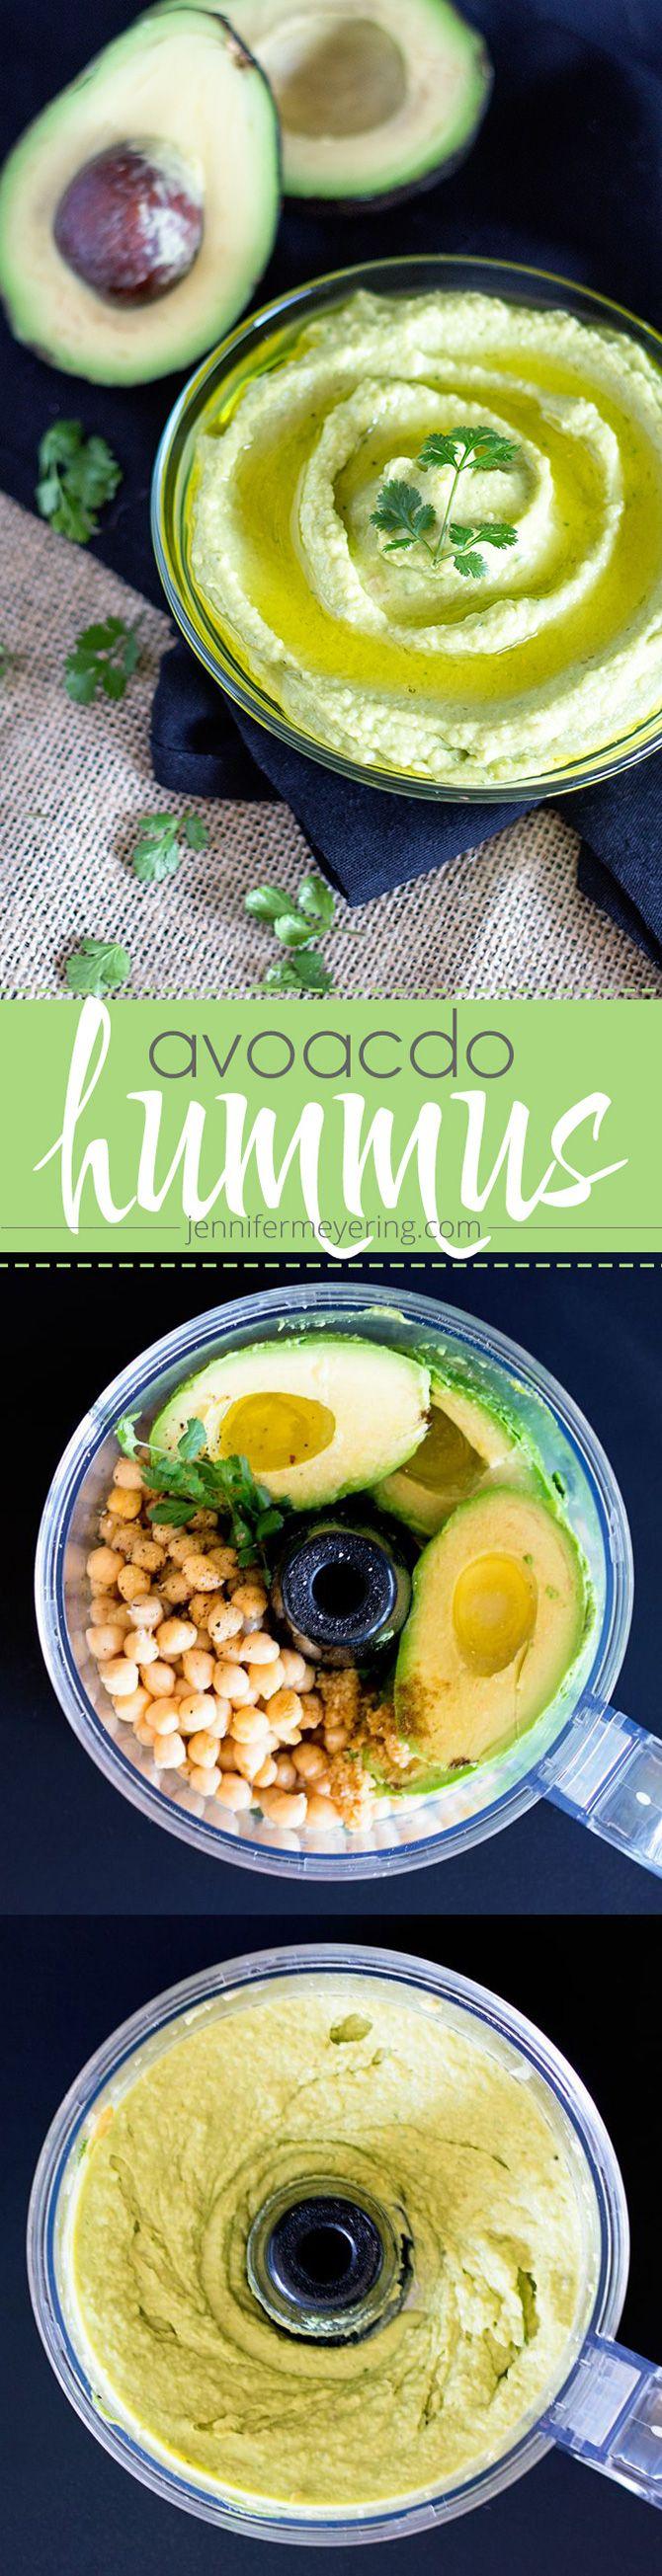 Avocado Hummus | JenniferMeyering.com